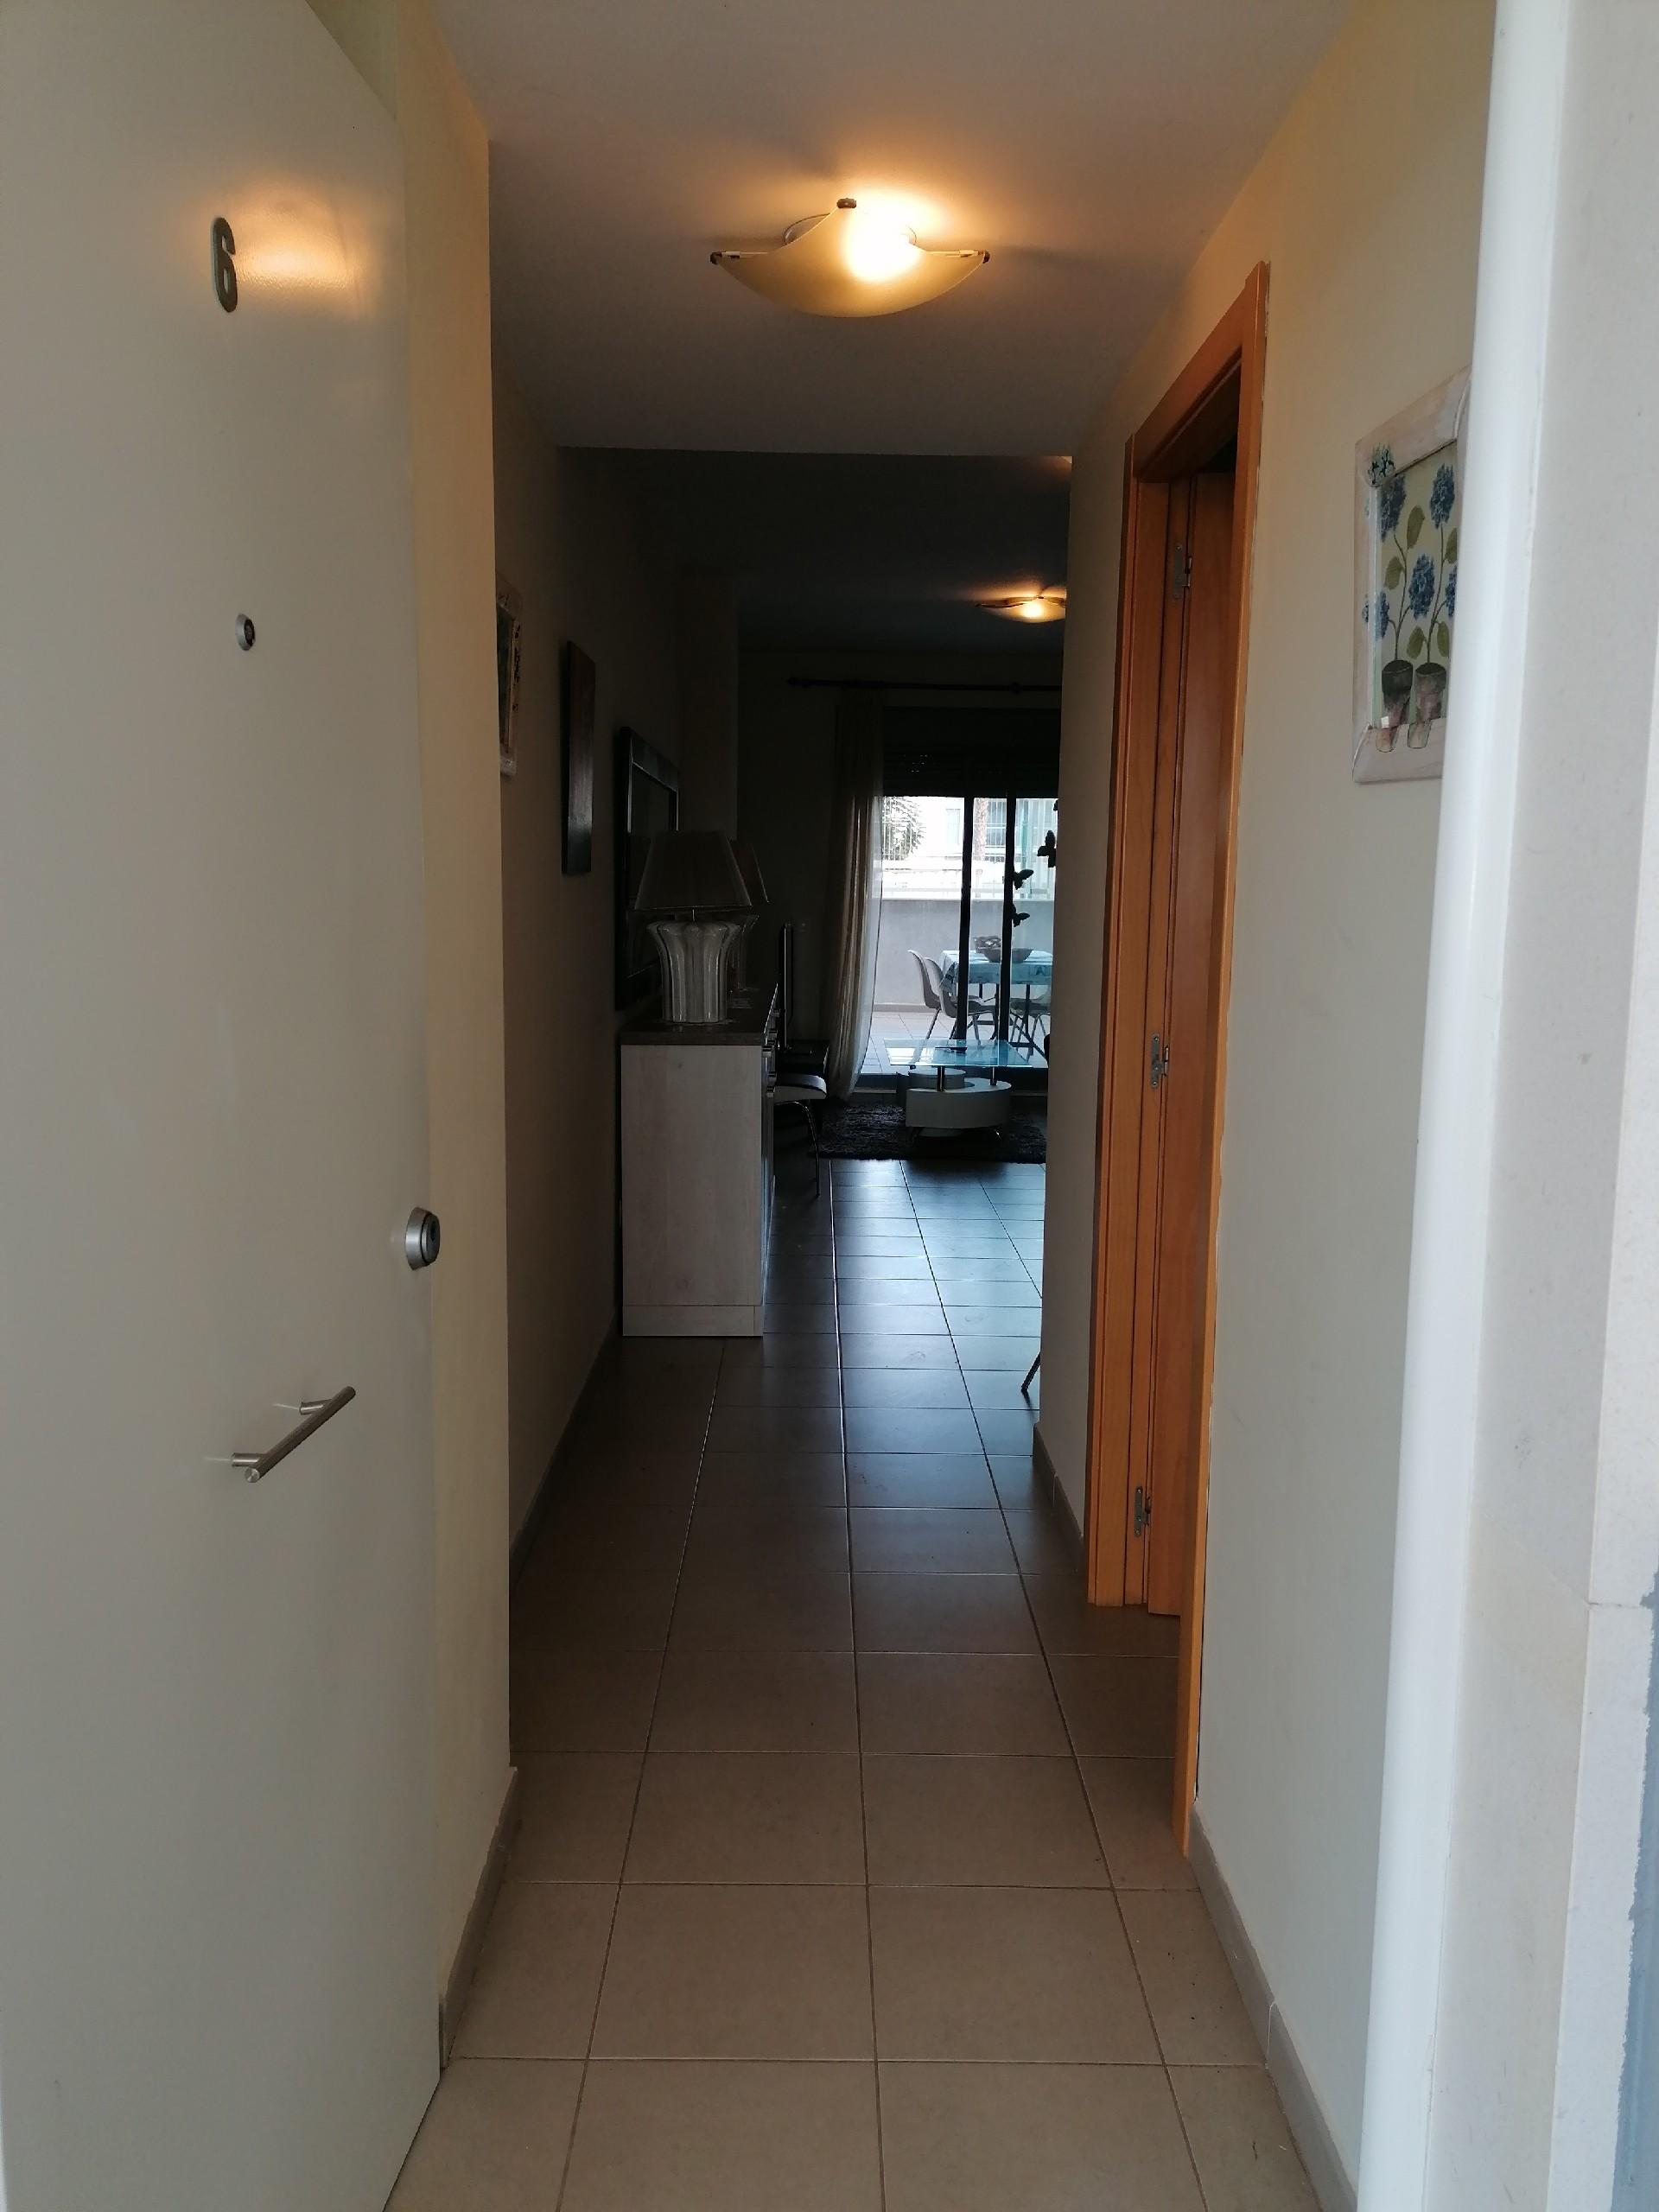 Miete Etagenwohnung  Calle costa brava, 7. Apartamento - almenara (playa)